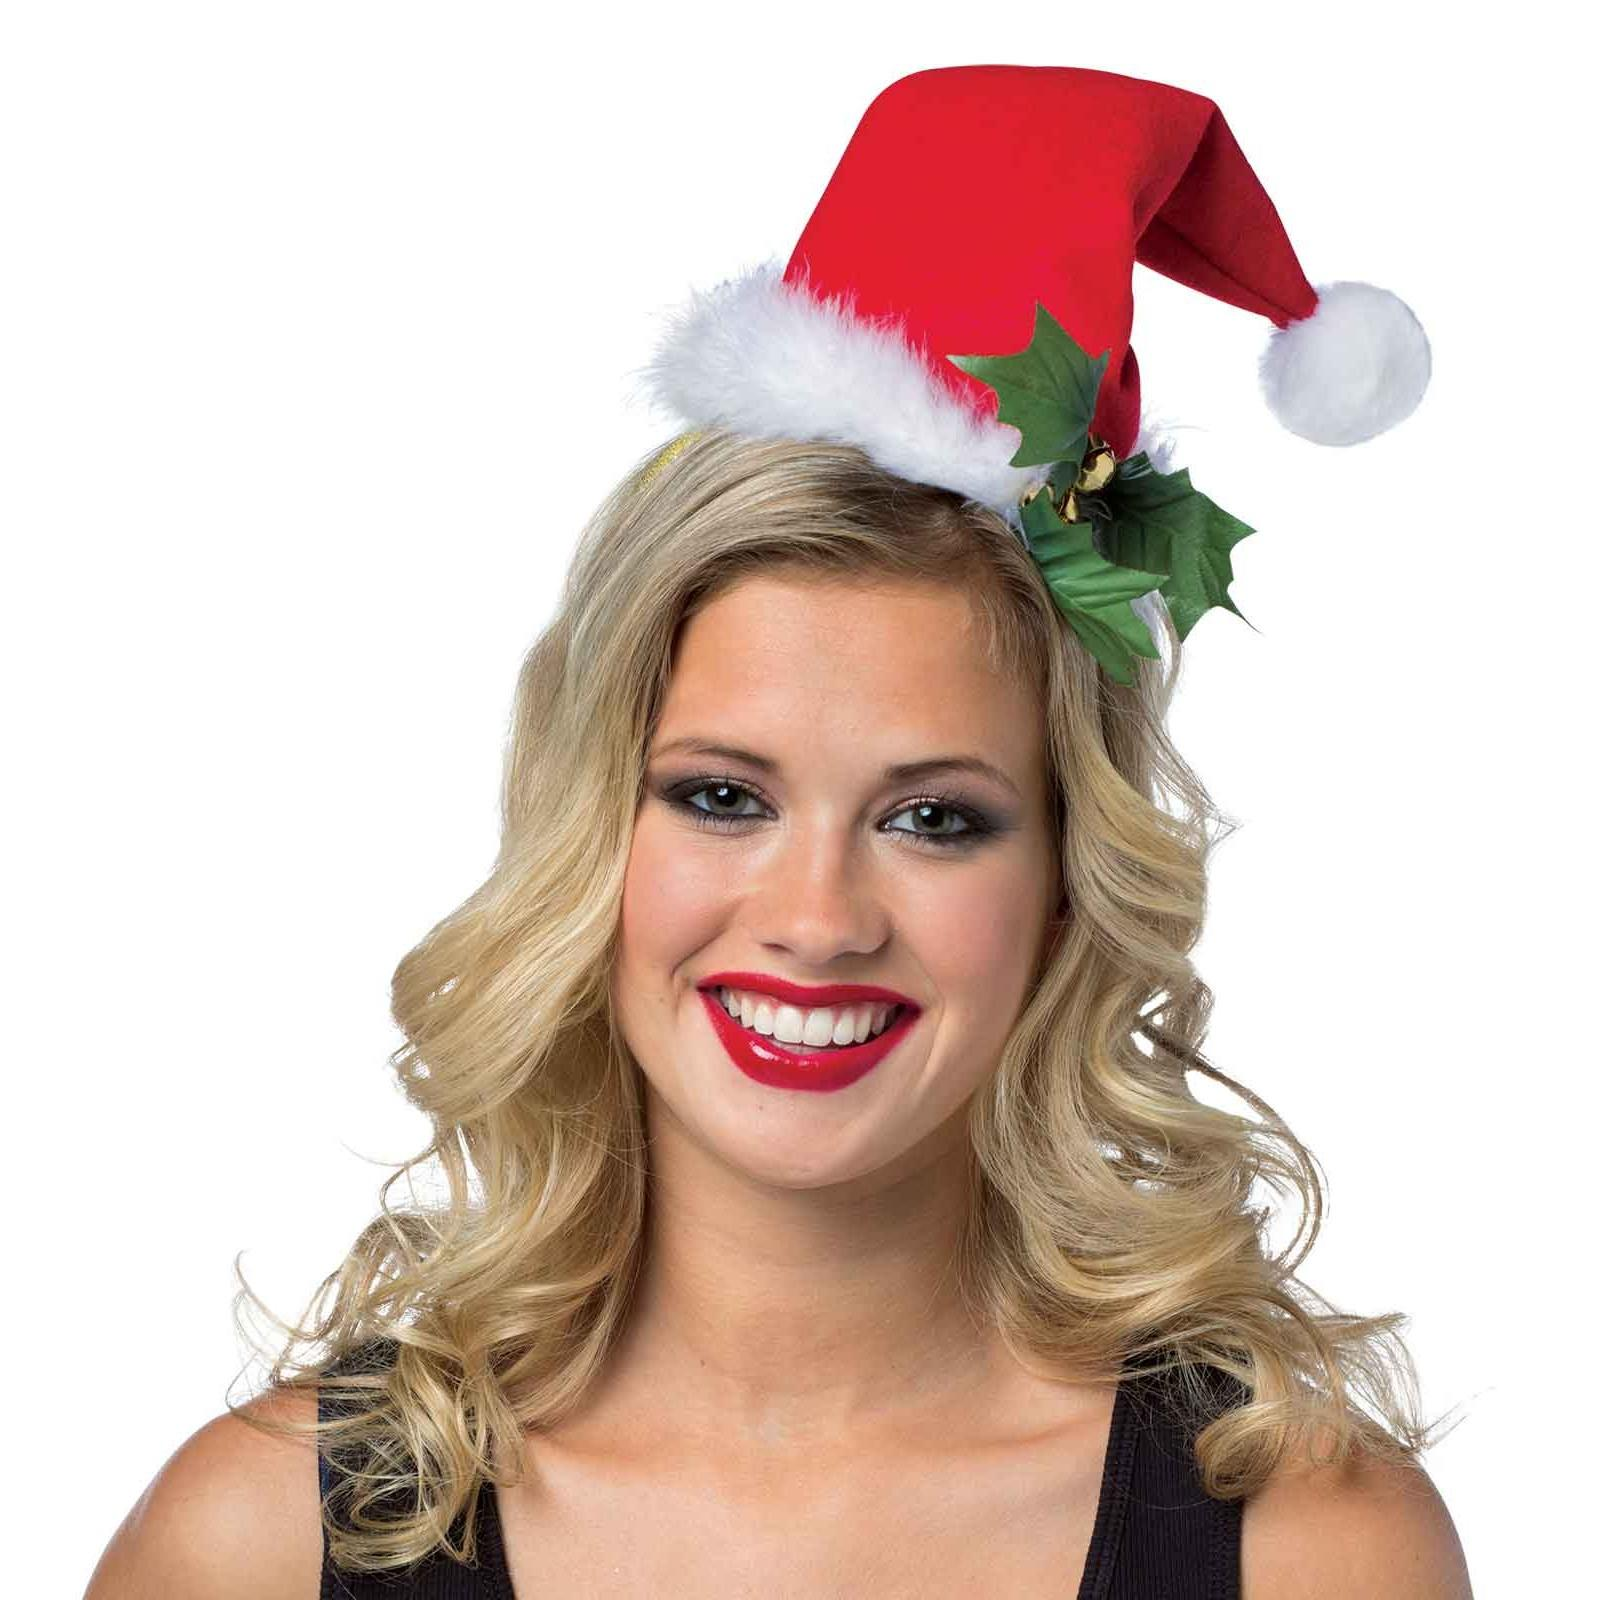 Christmas Headband For Adults.Santa Hat Headband For Women Halloween Accessory One Size